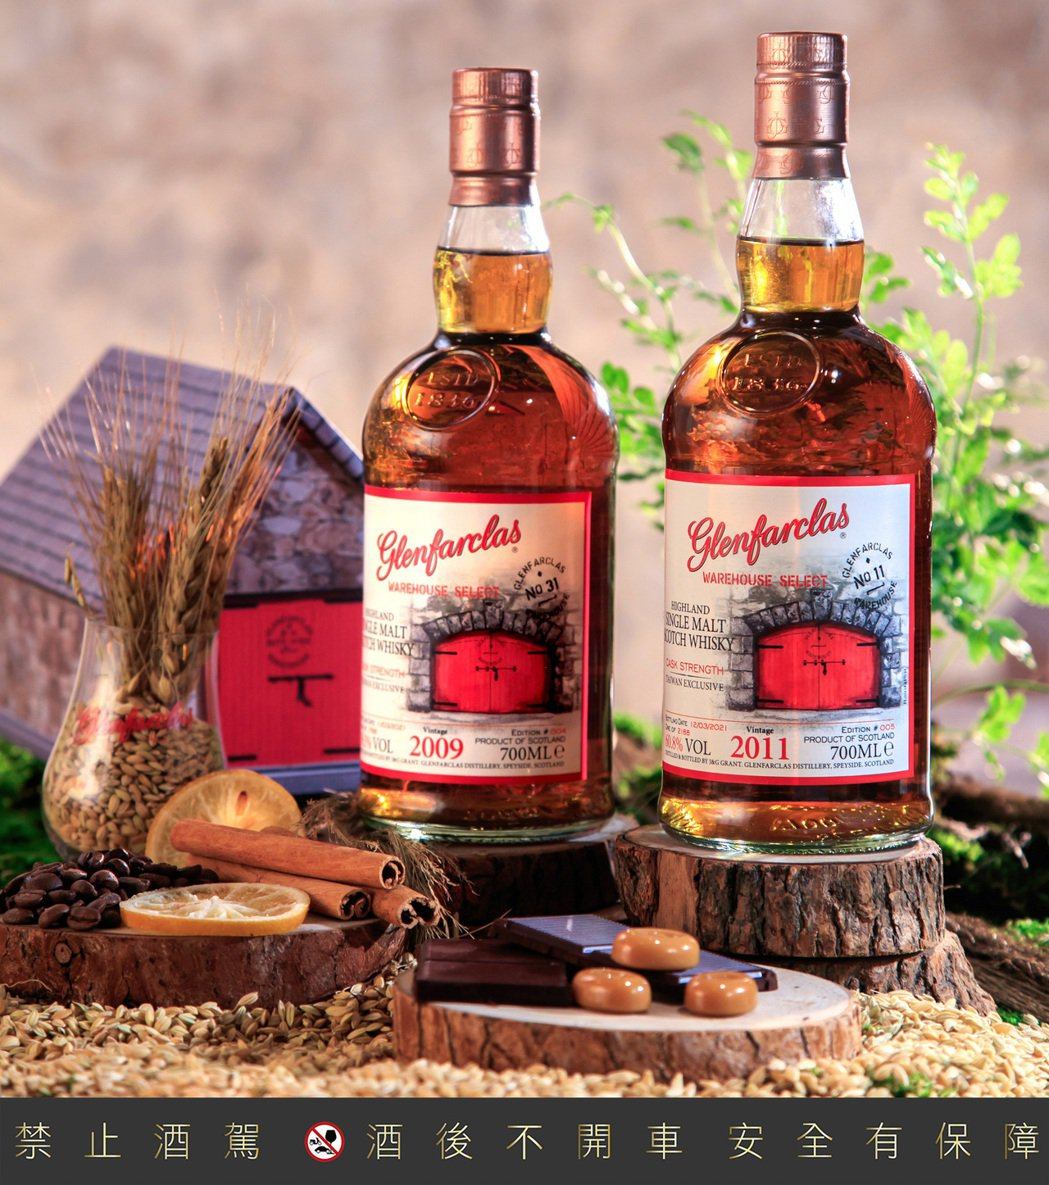 Glenfarclas格蘭花格紅門窖藏原酒系列EDITION 004、005上市...